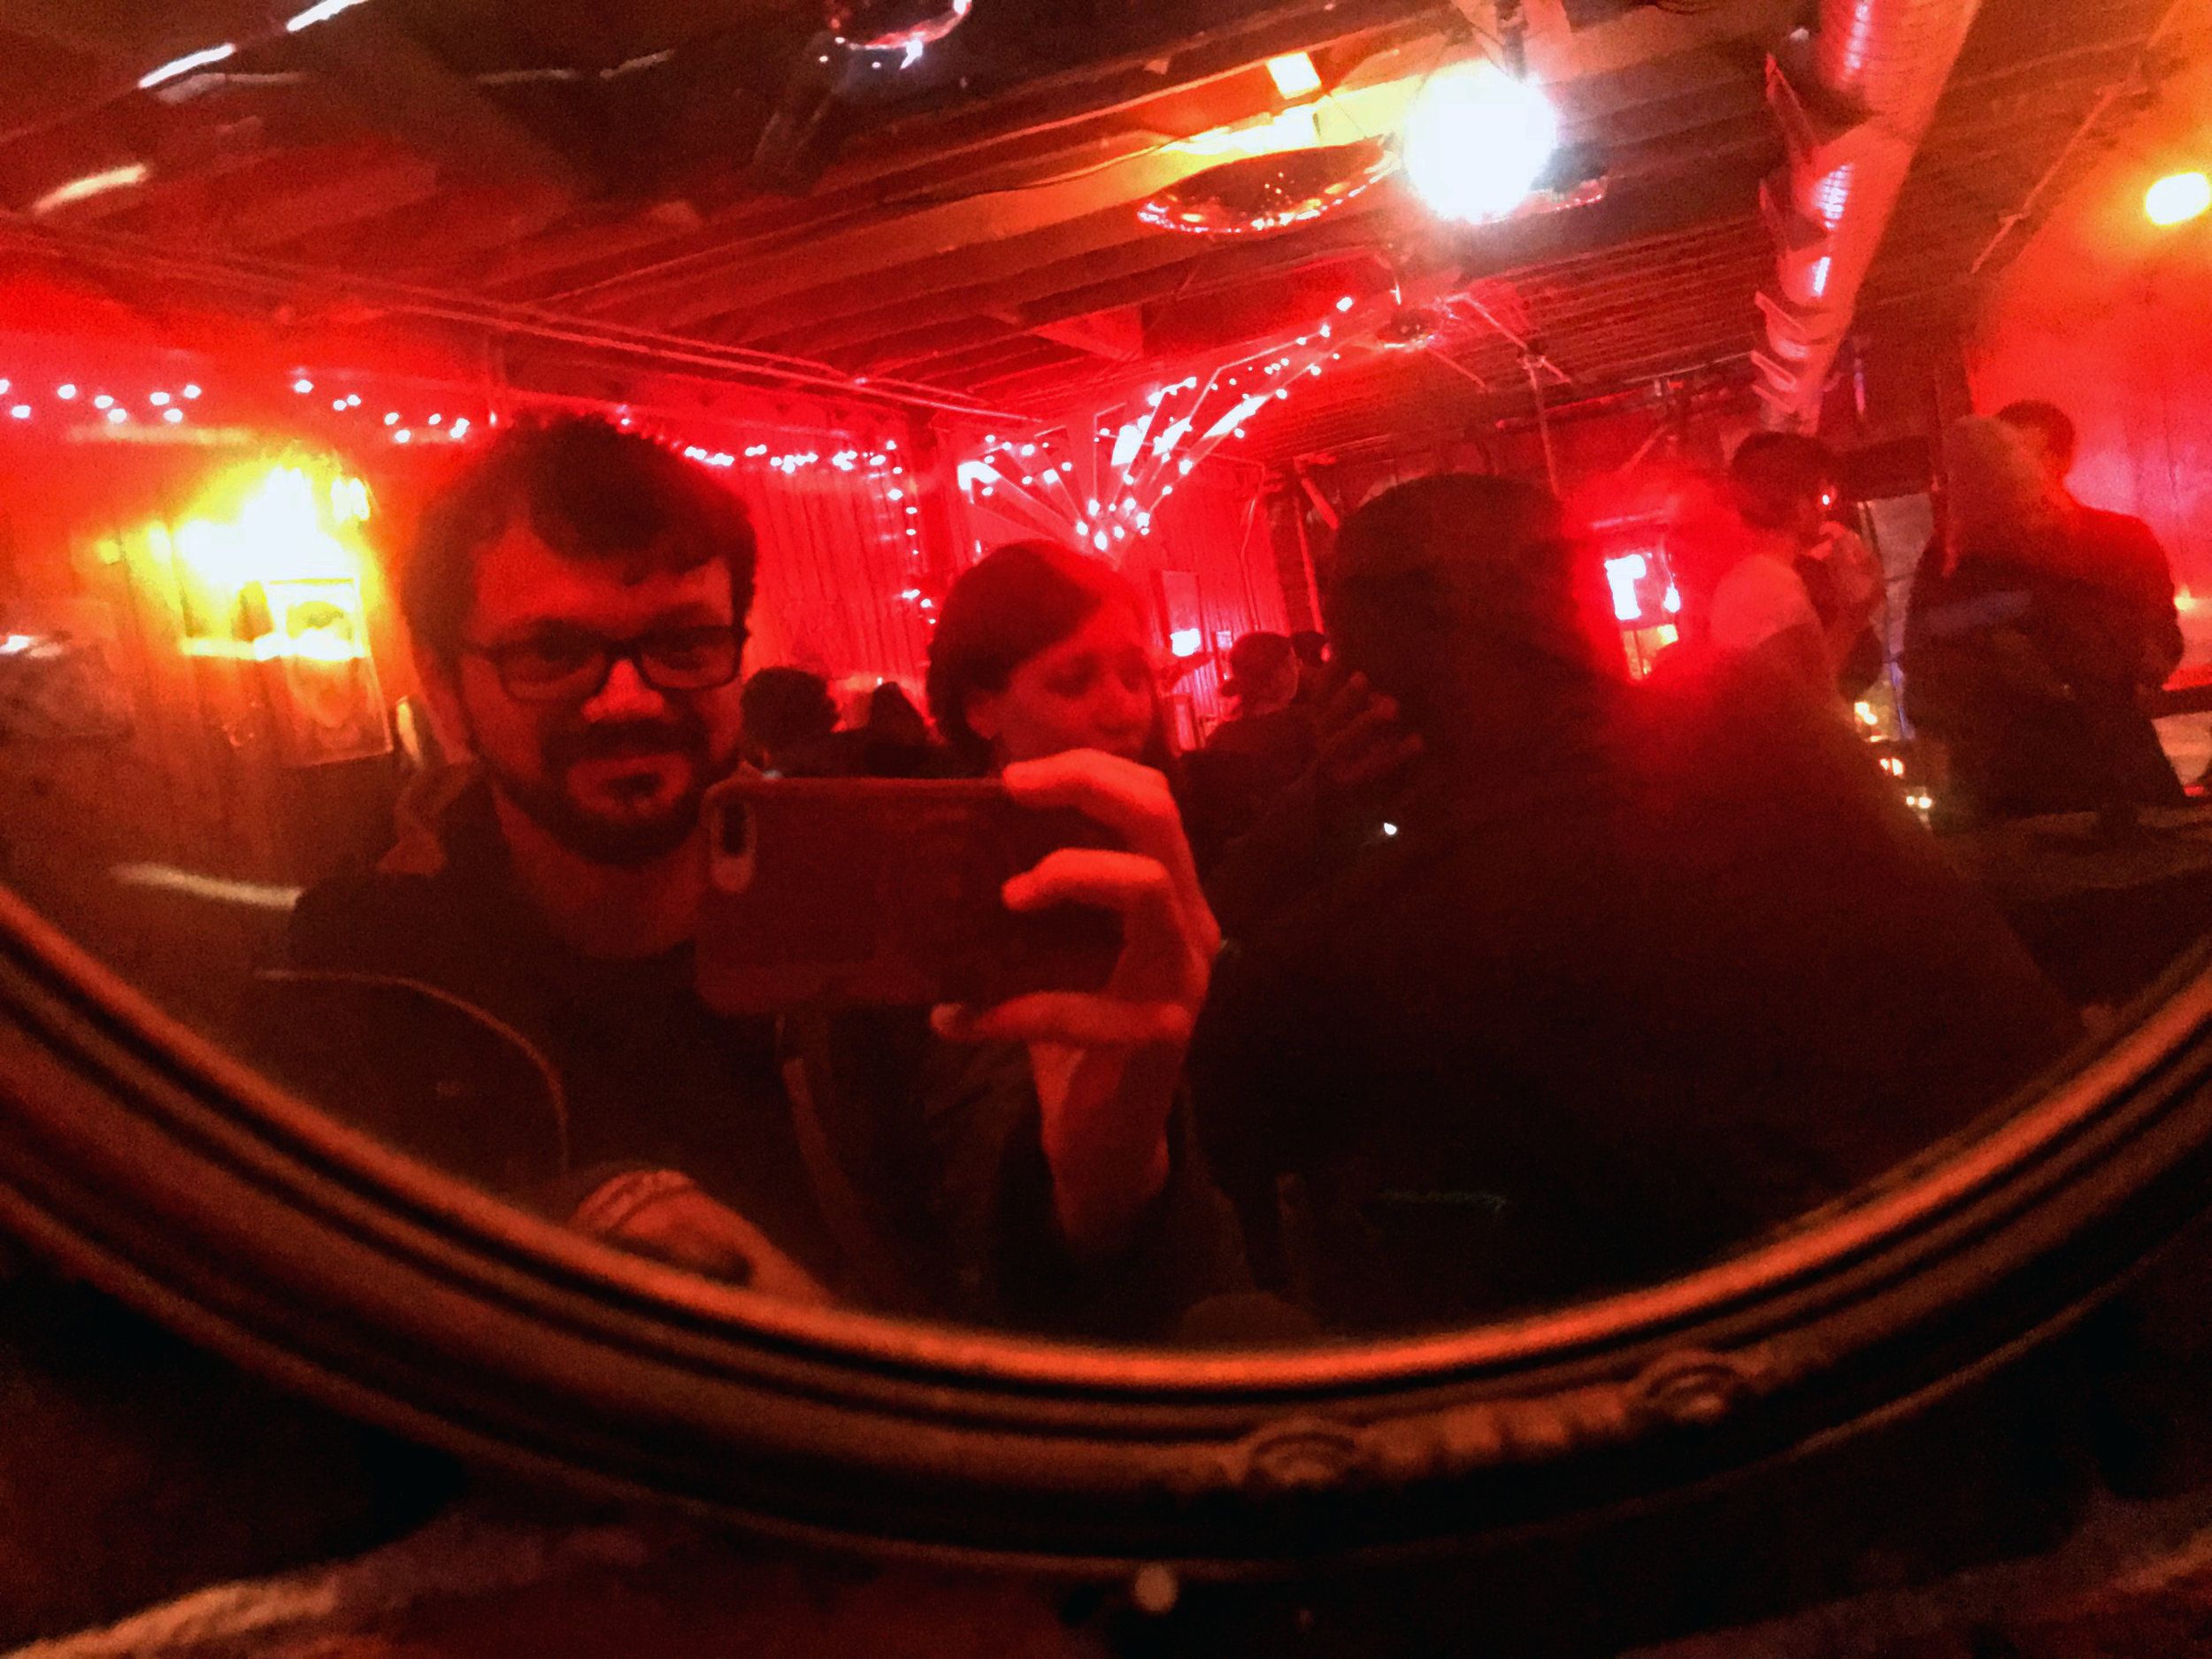 Bar Selfie